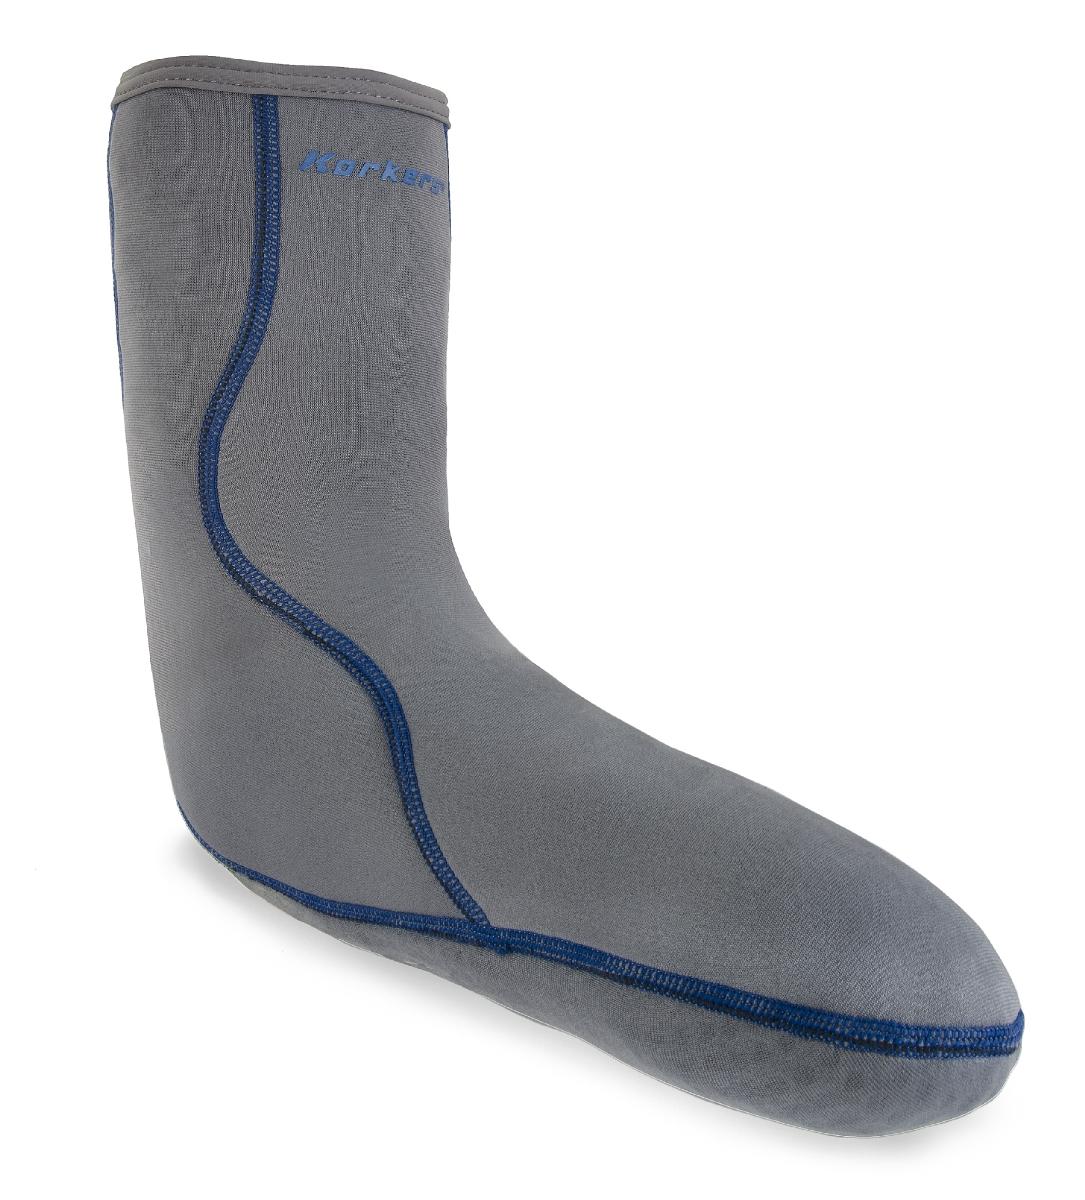 sock-gray-rev21500422478-6113.jpg